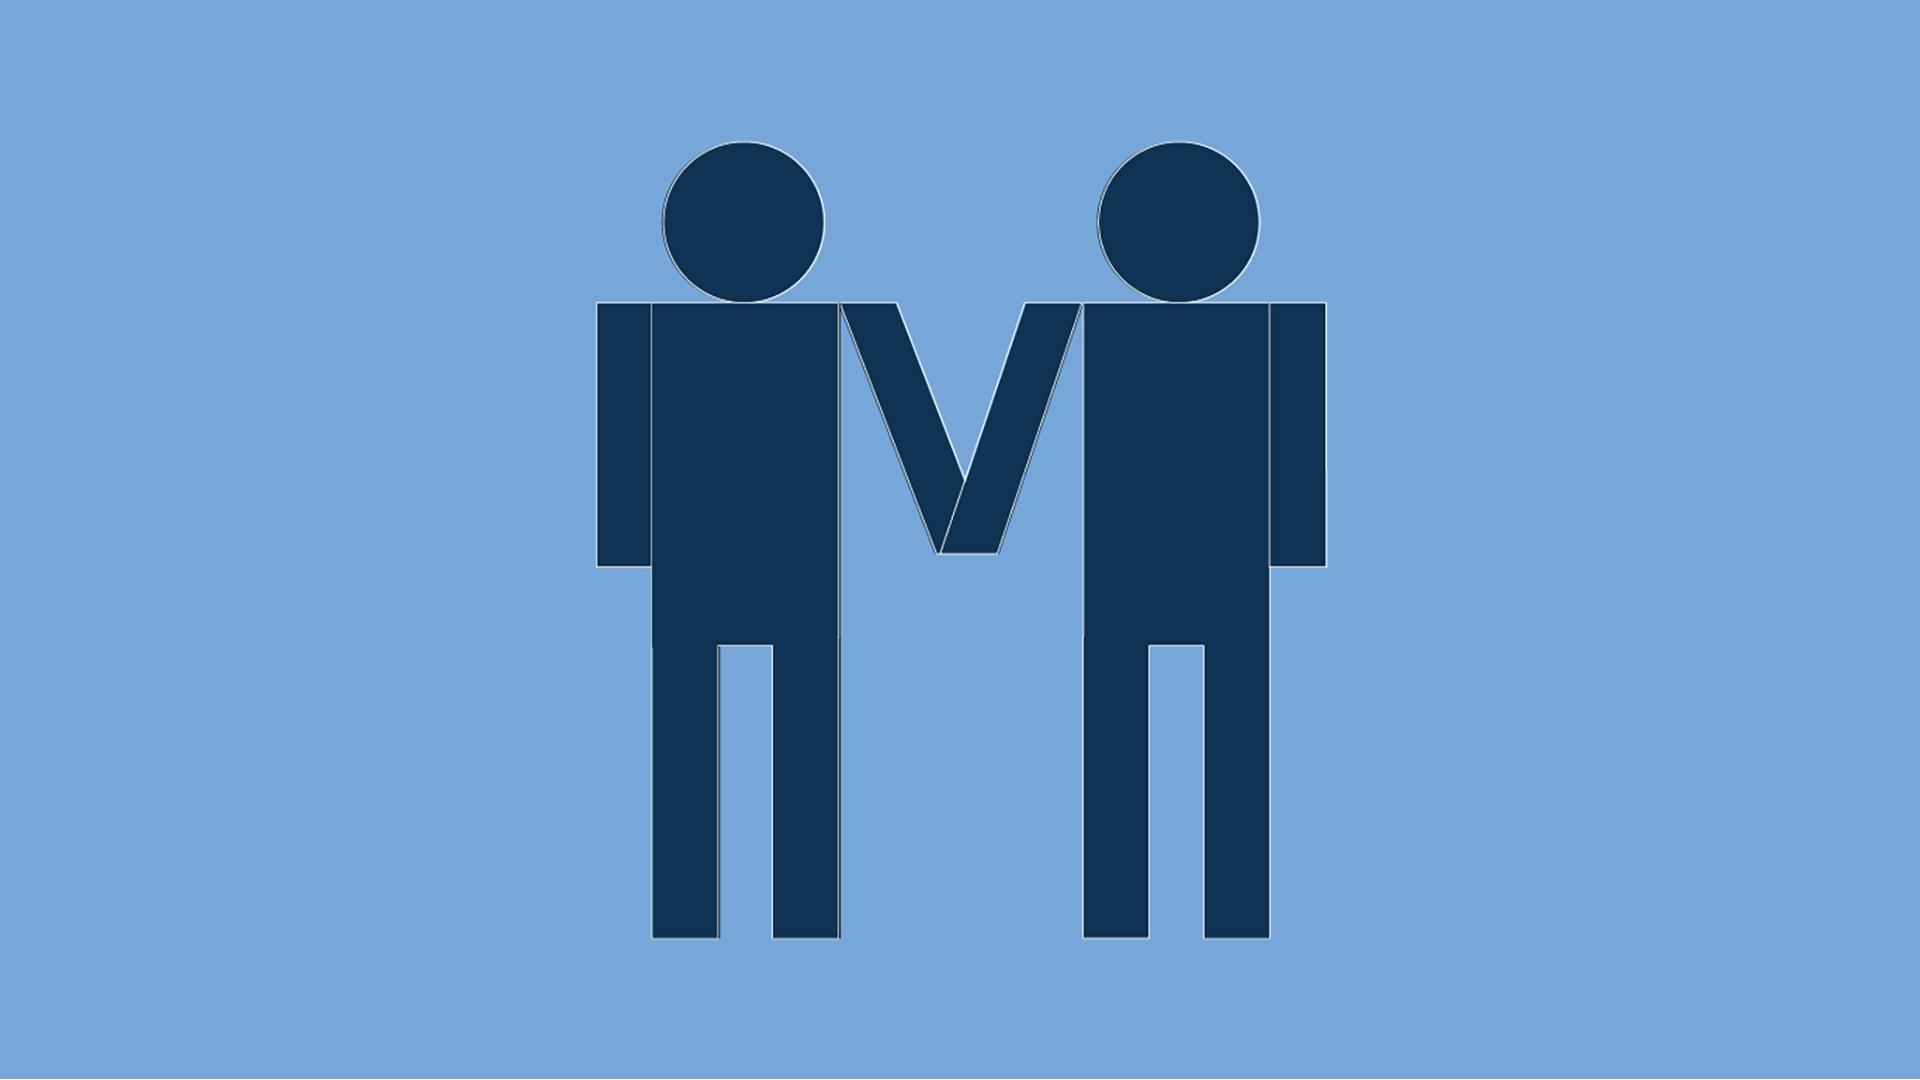 LGBTQI (男女同性恋者、双性恋者、变性者、跨性别者)